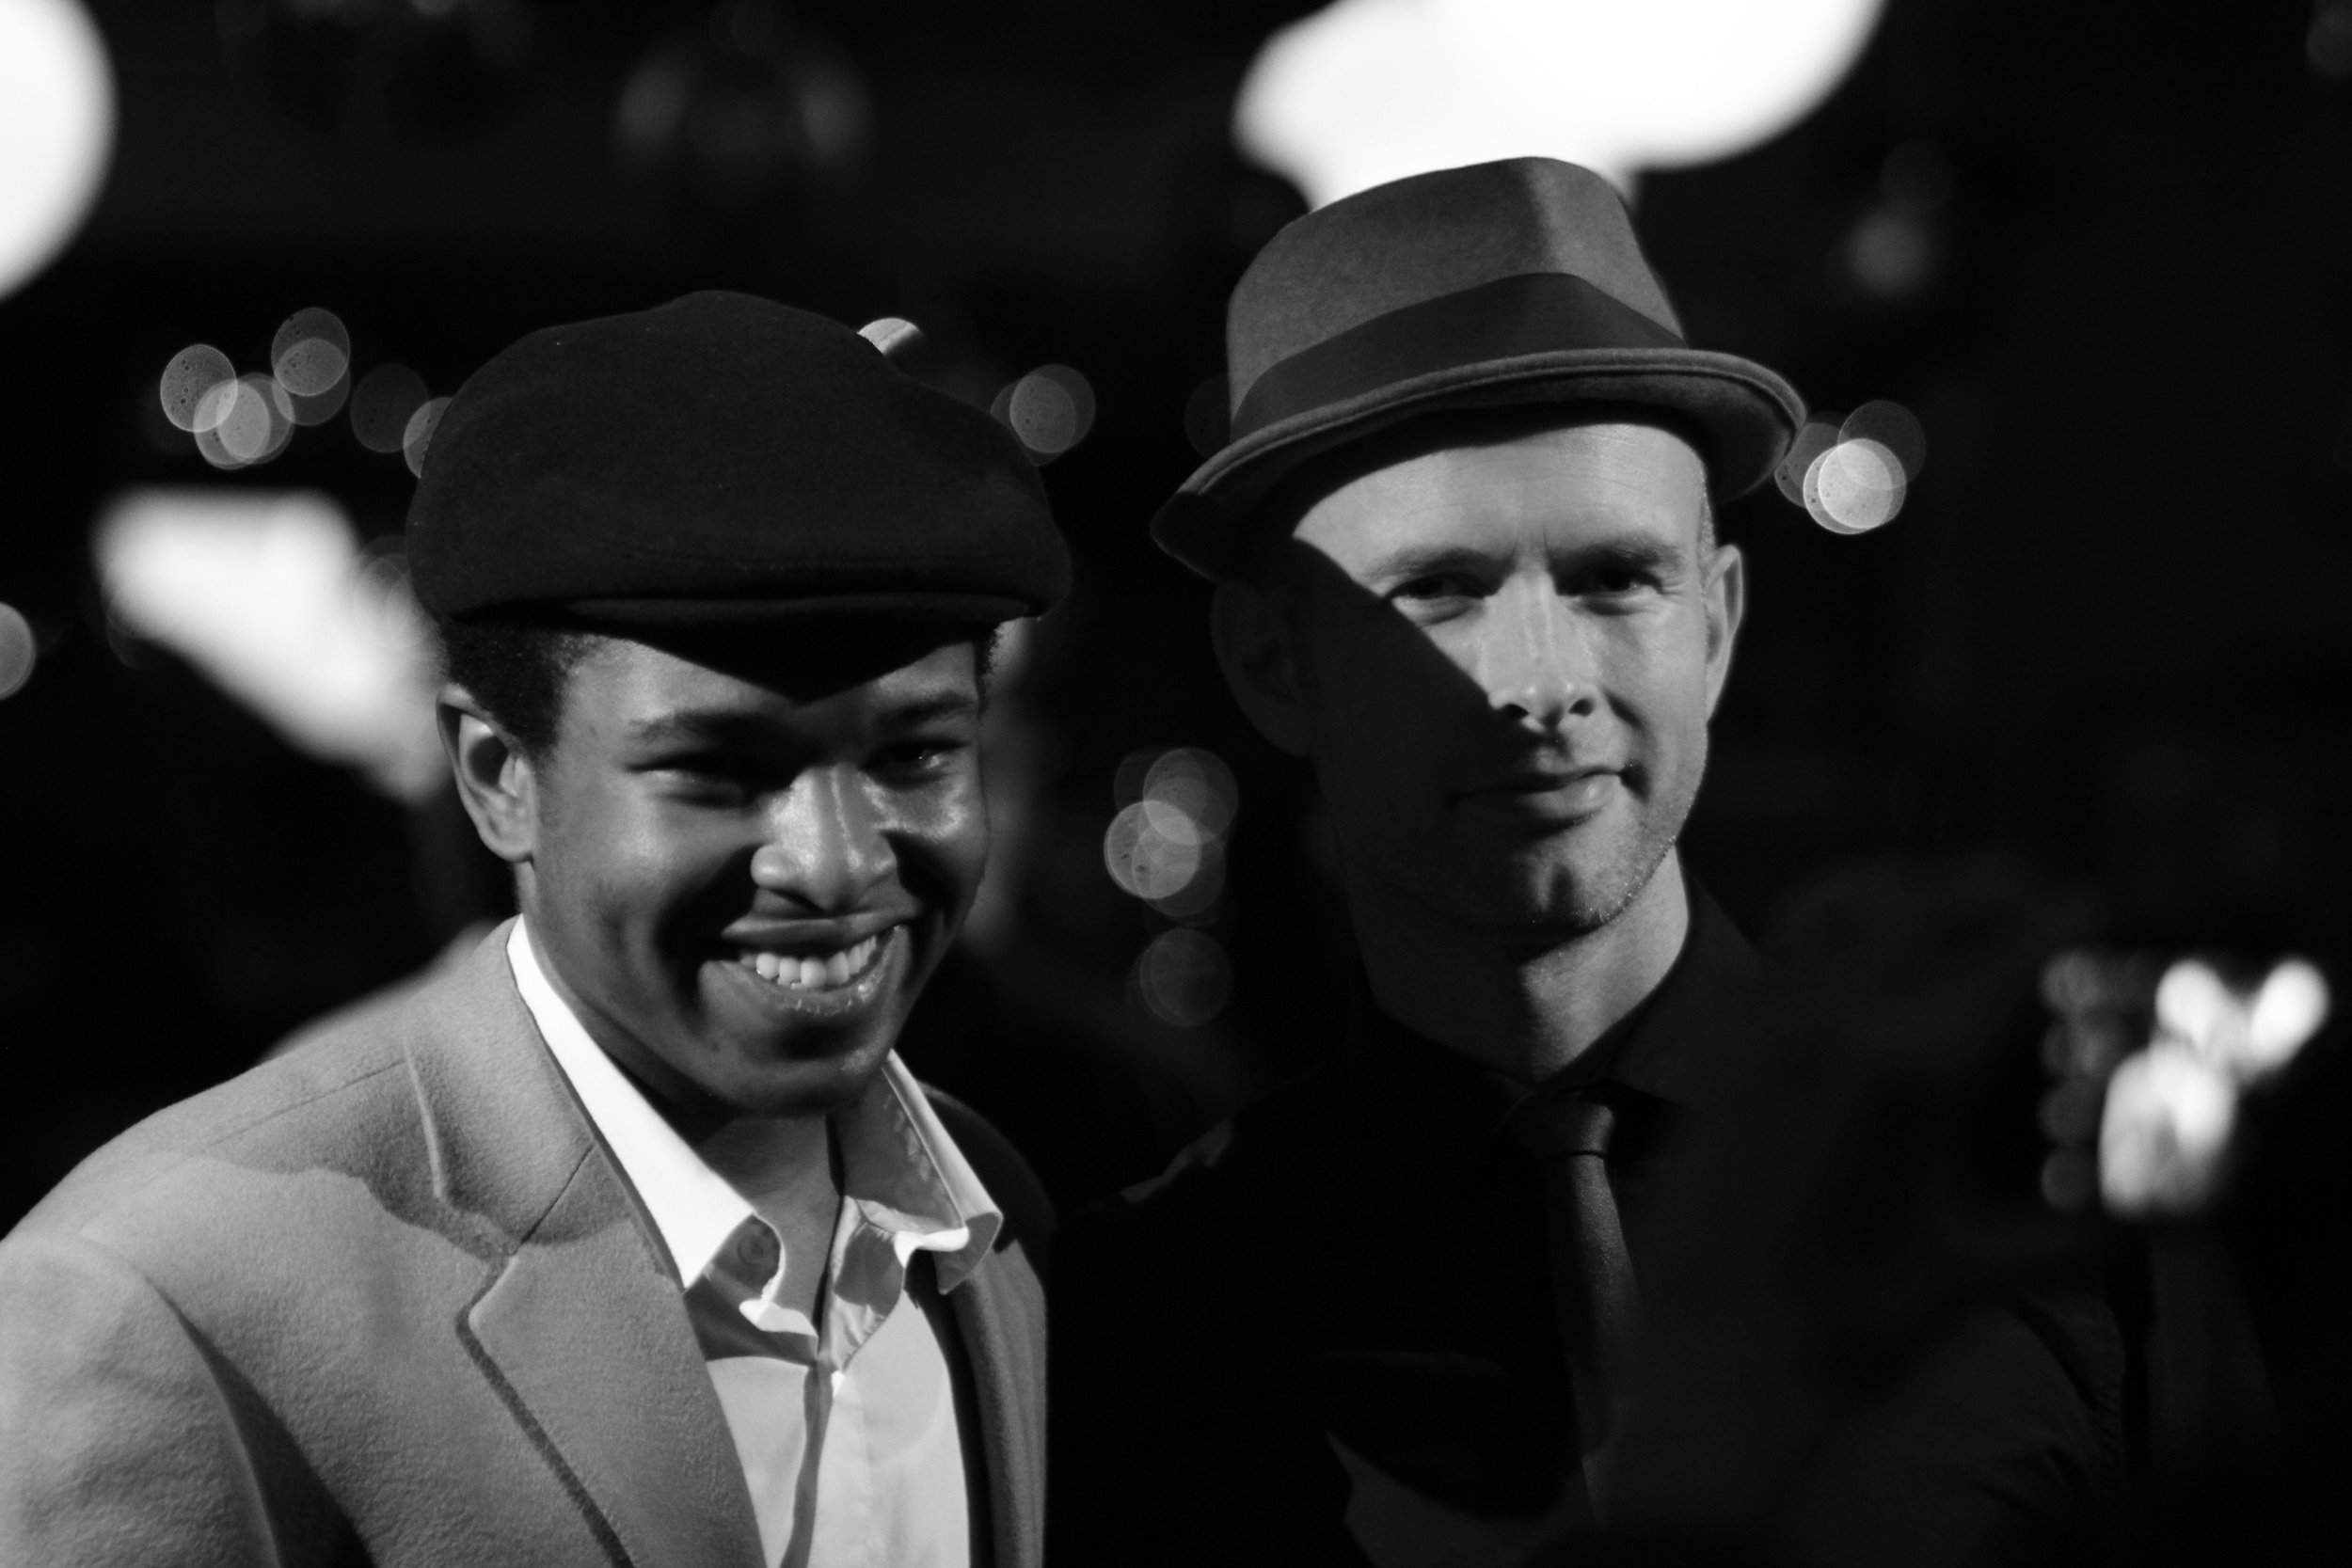 peter and the master keys jazz wedding new york event concert solomon hicks blues